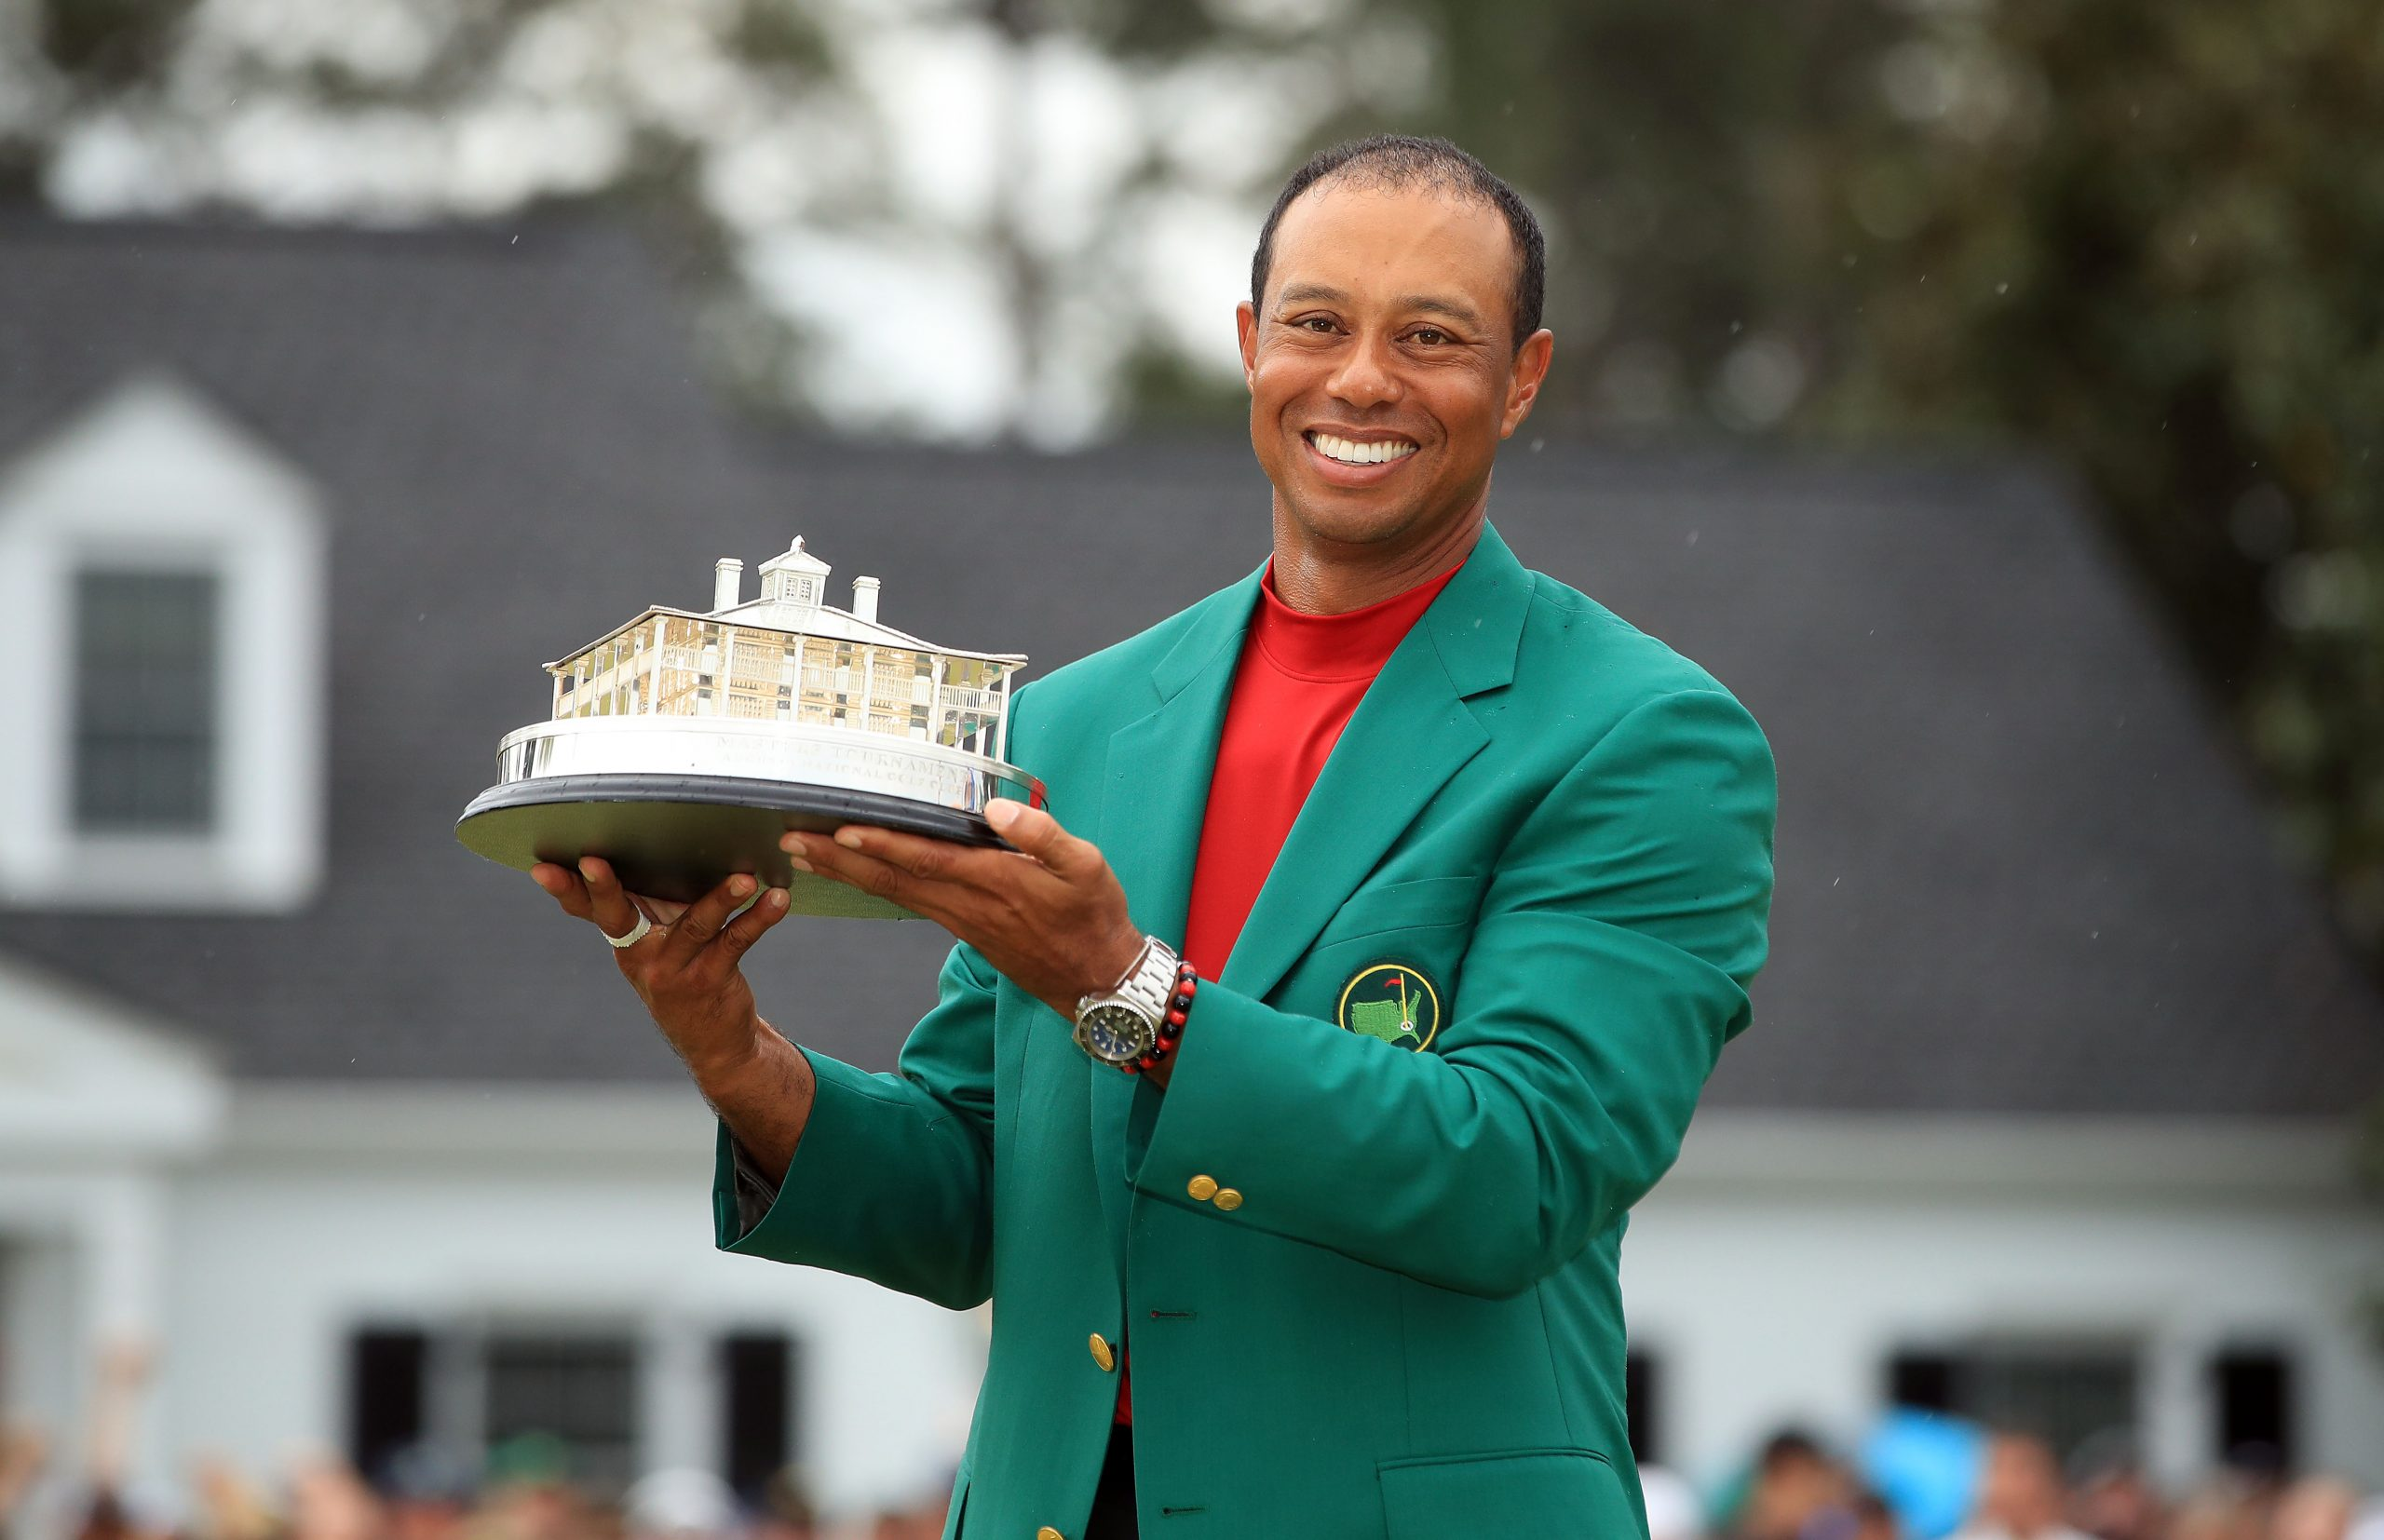 Perks Of Winning The Masters